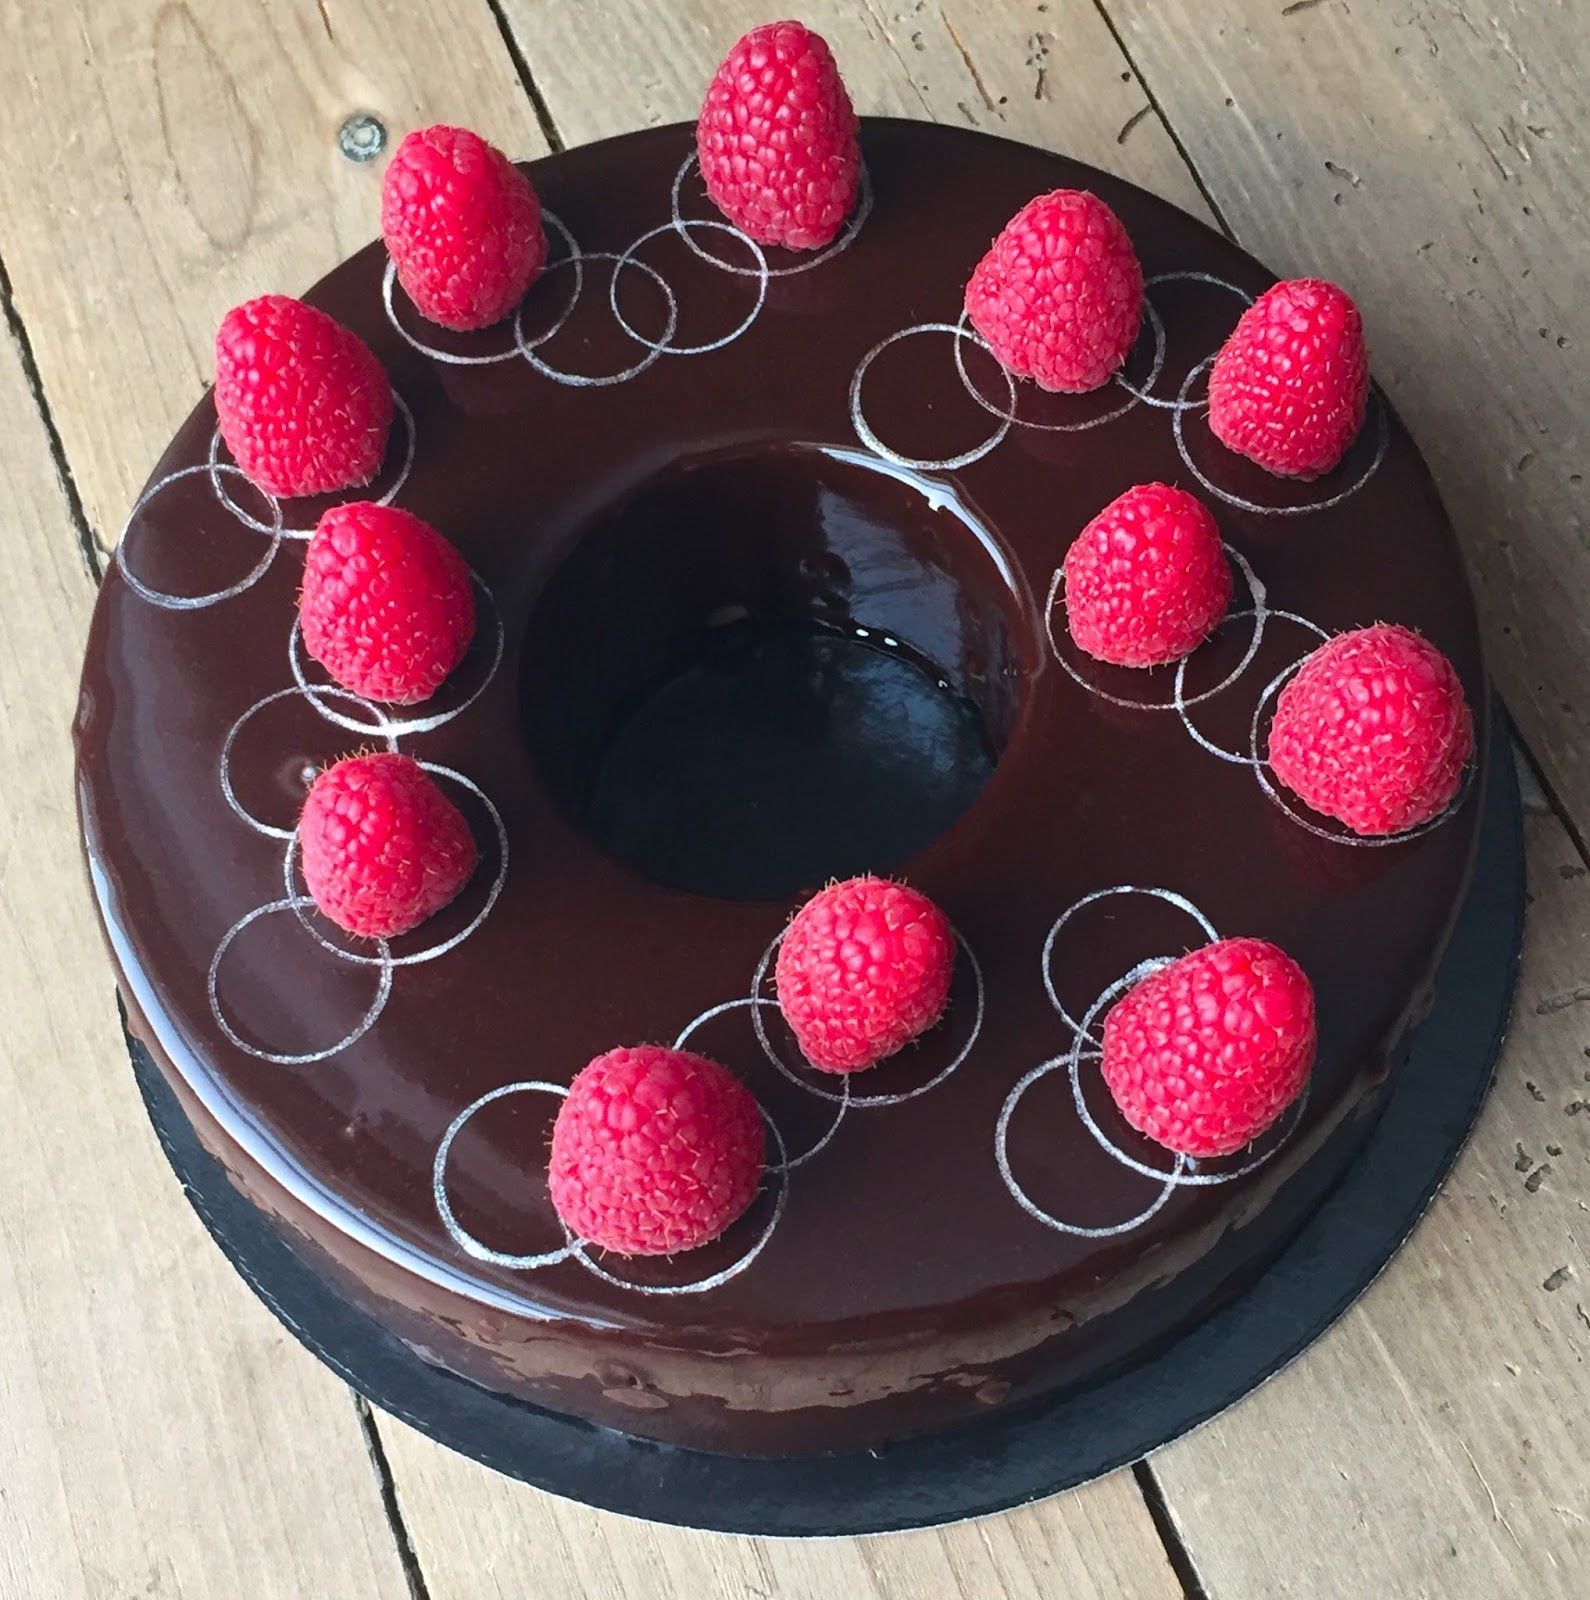 J En Reste Baba Chocolat Recettes De Patisserie Chocolat Noir